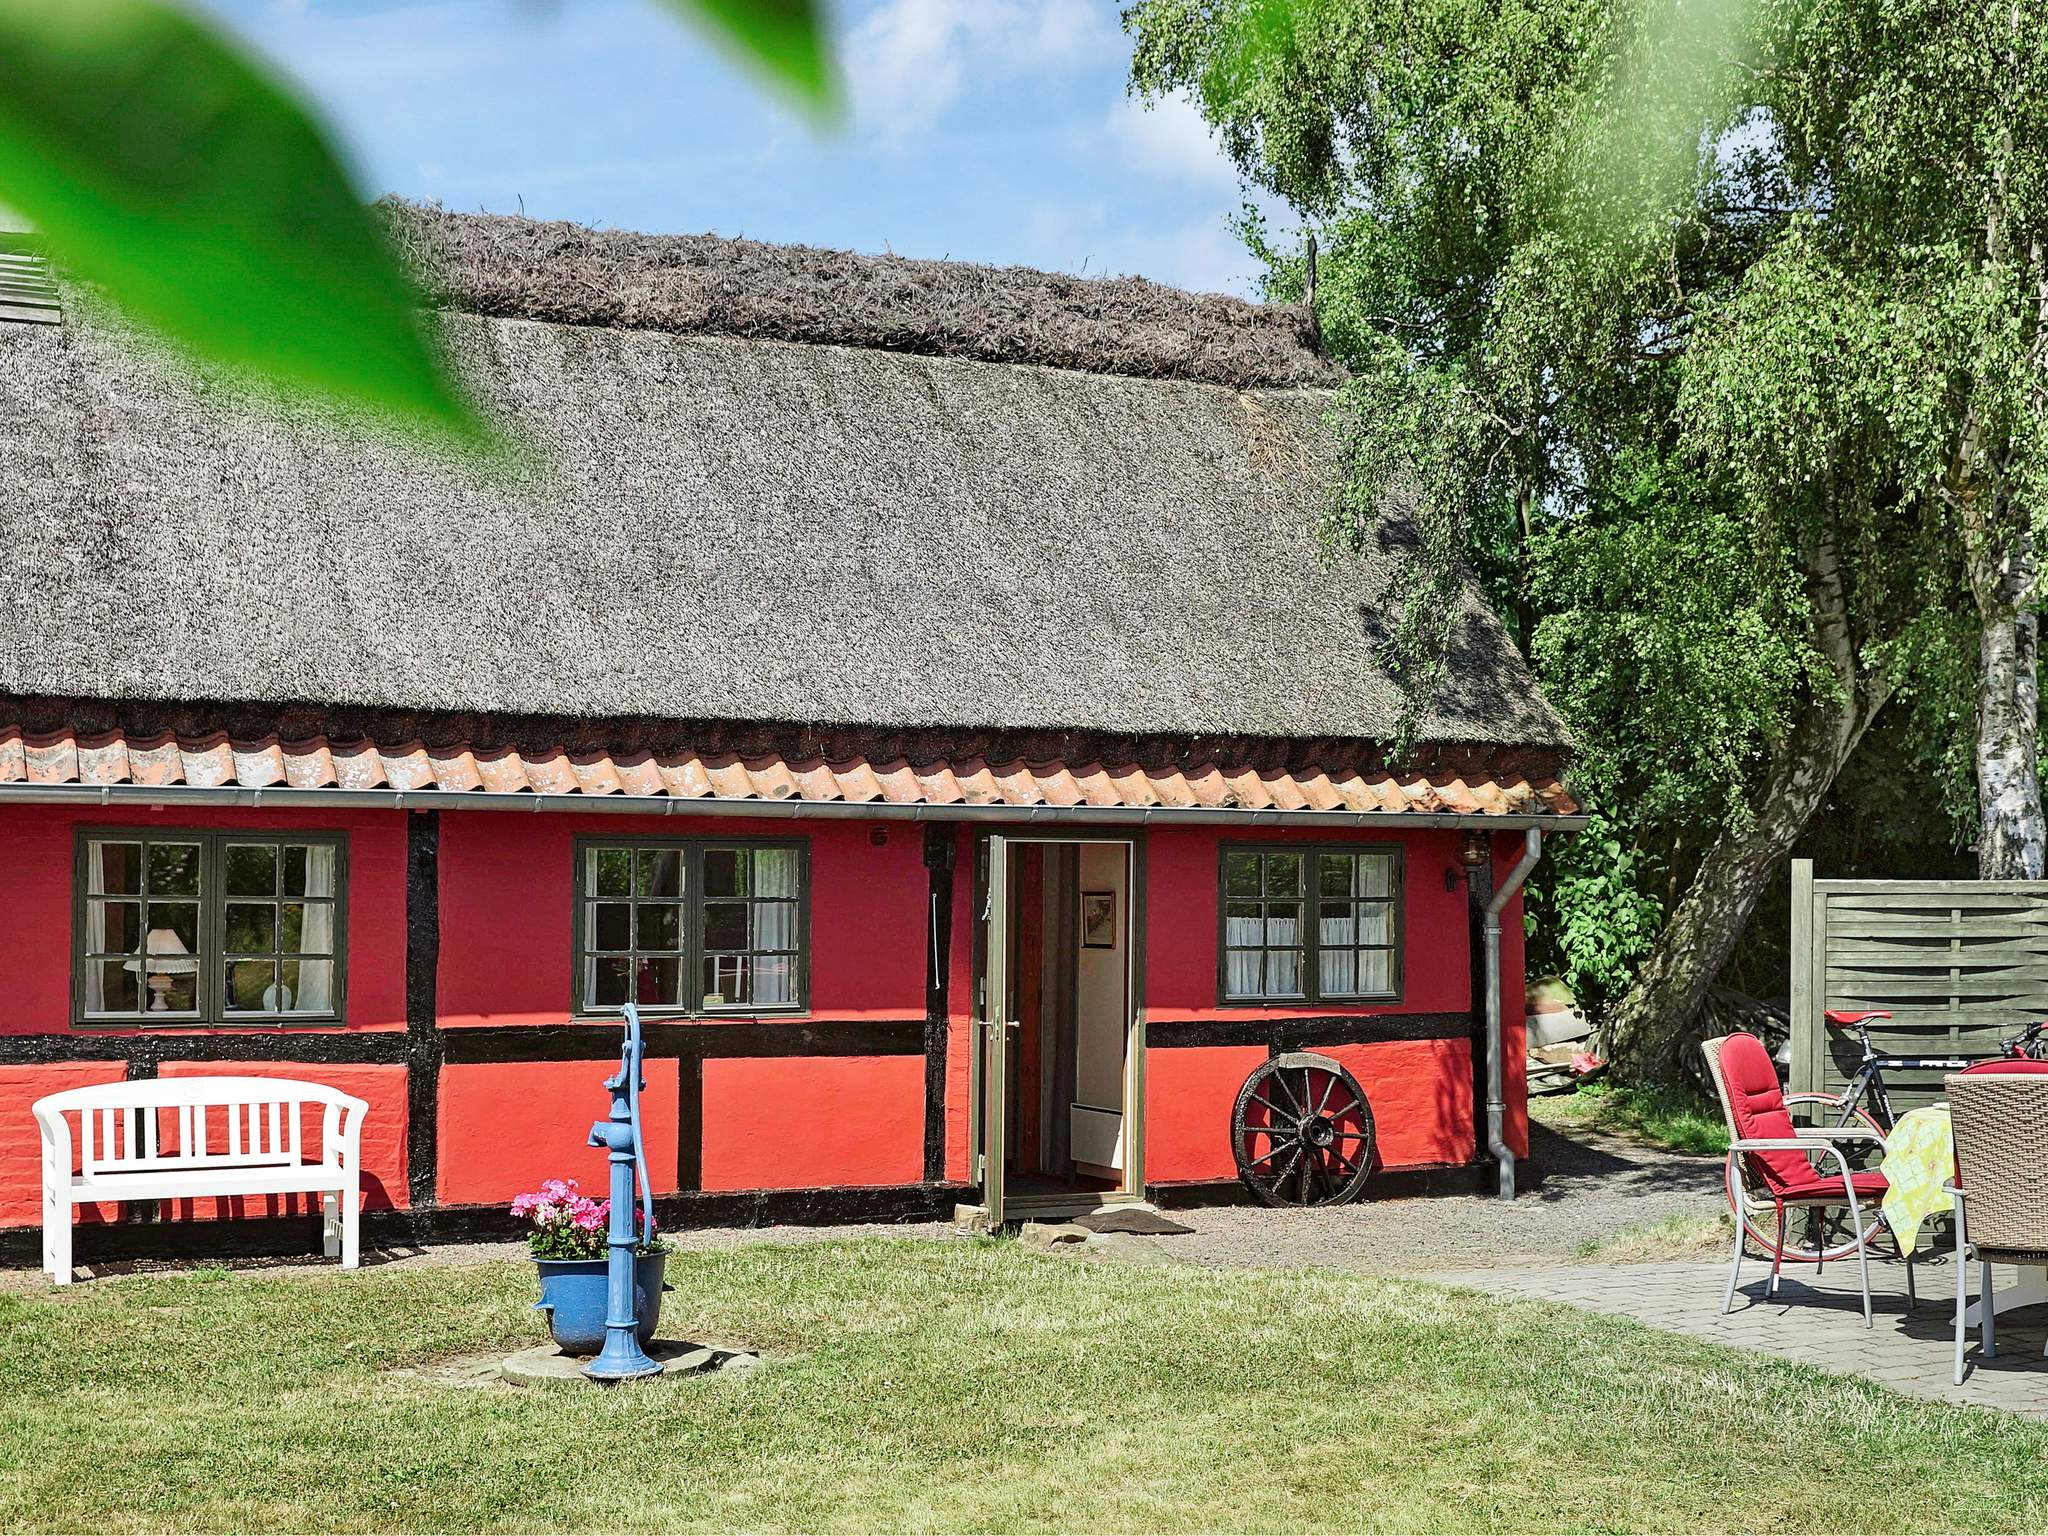 Ferienhaus Balka Strand (81872), Balke, , Bornholm, Dänemark, Bild 2